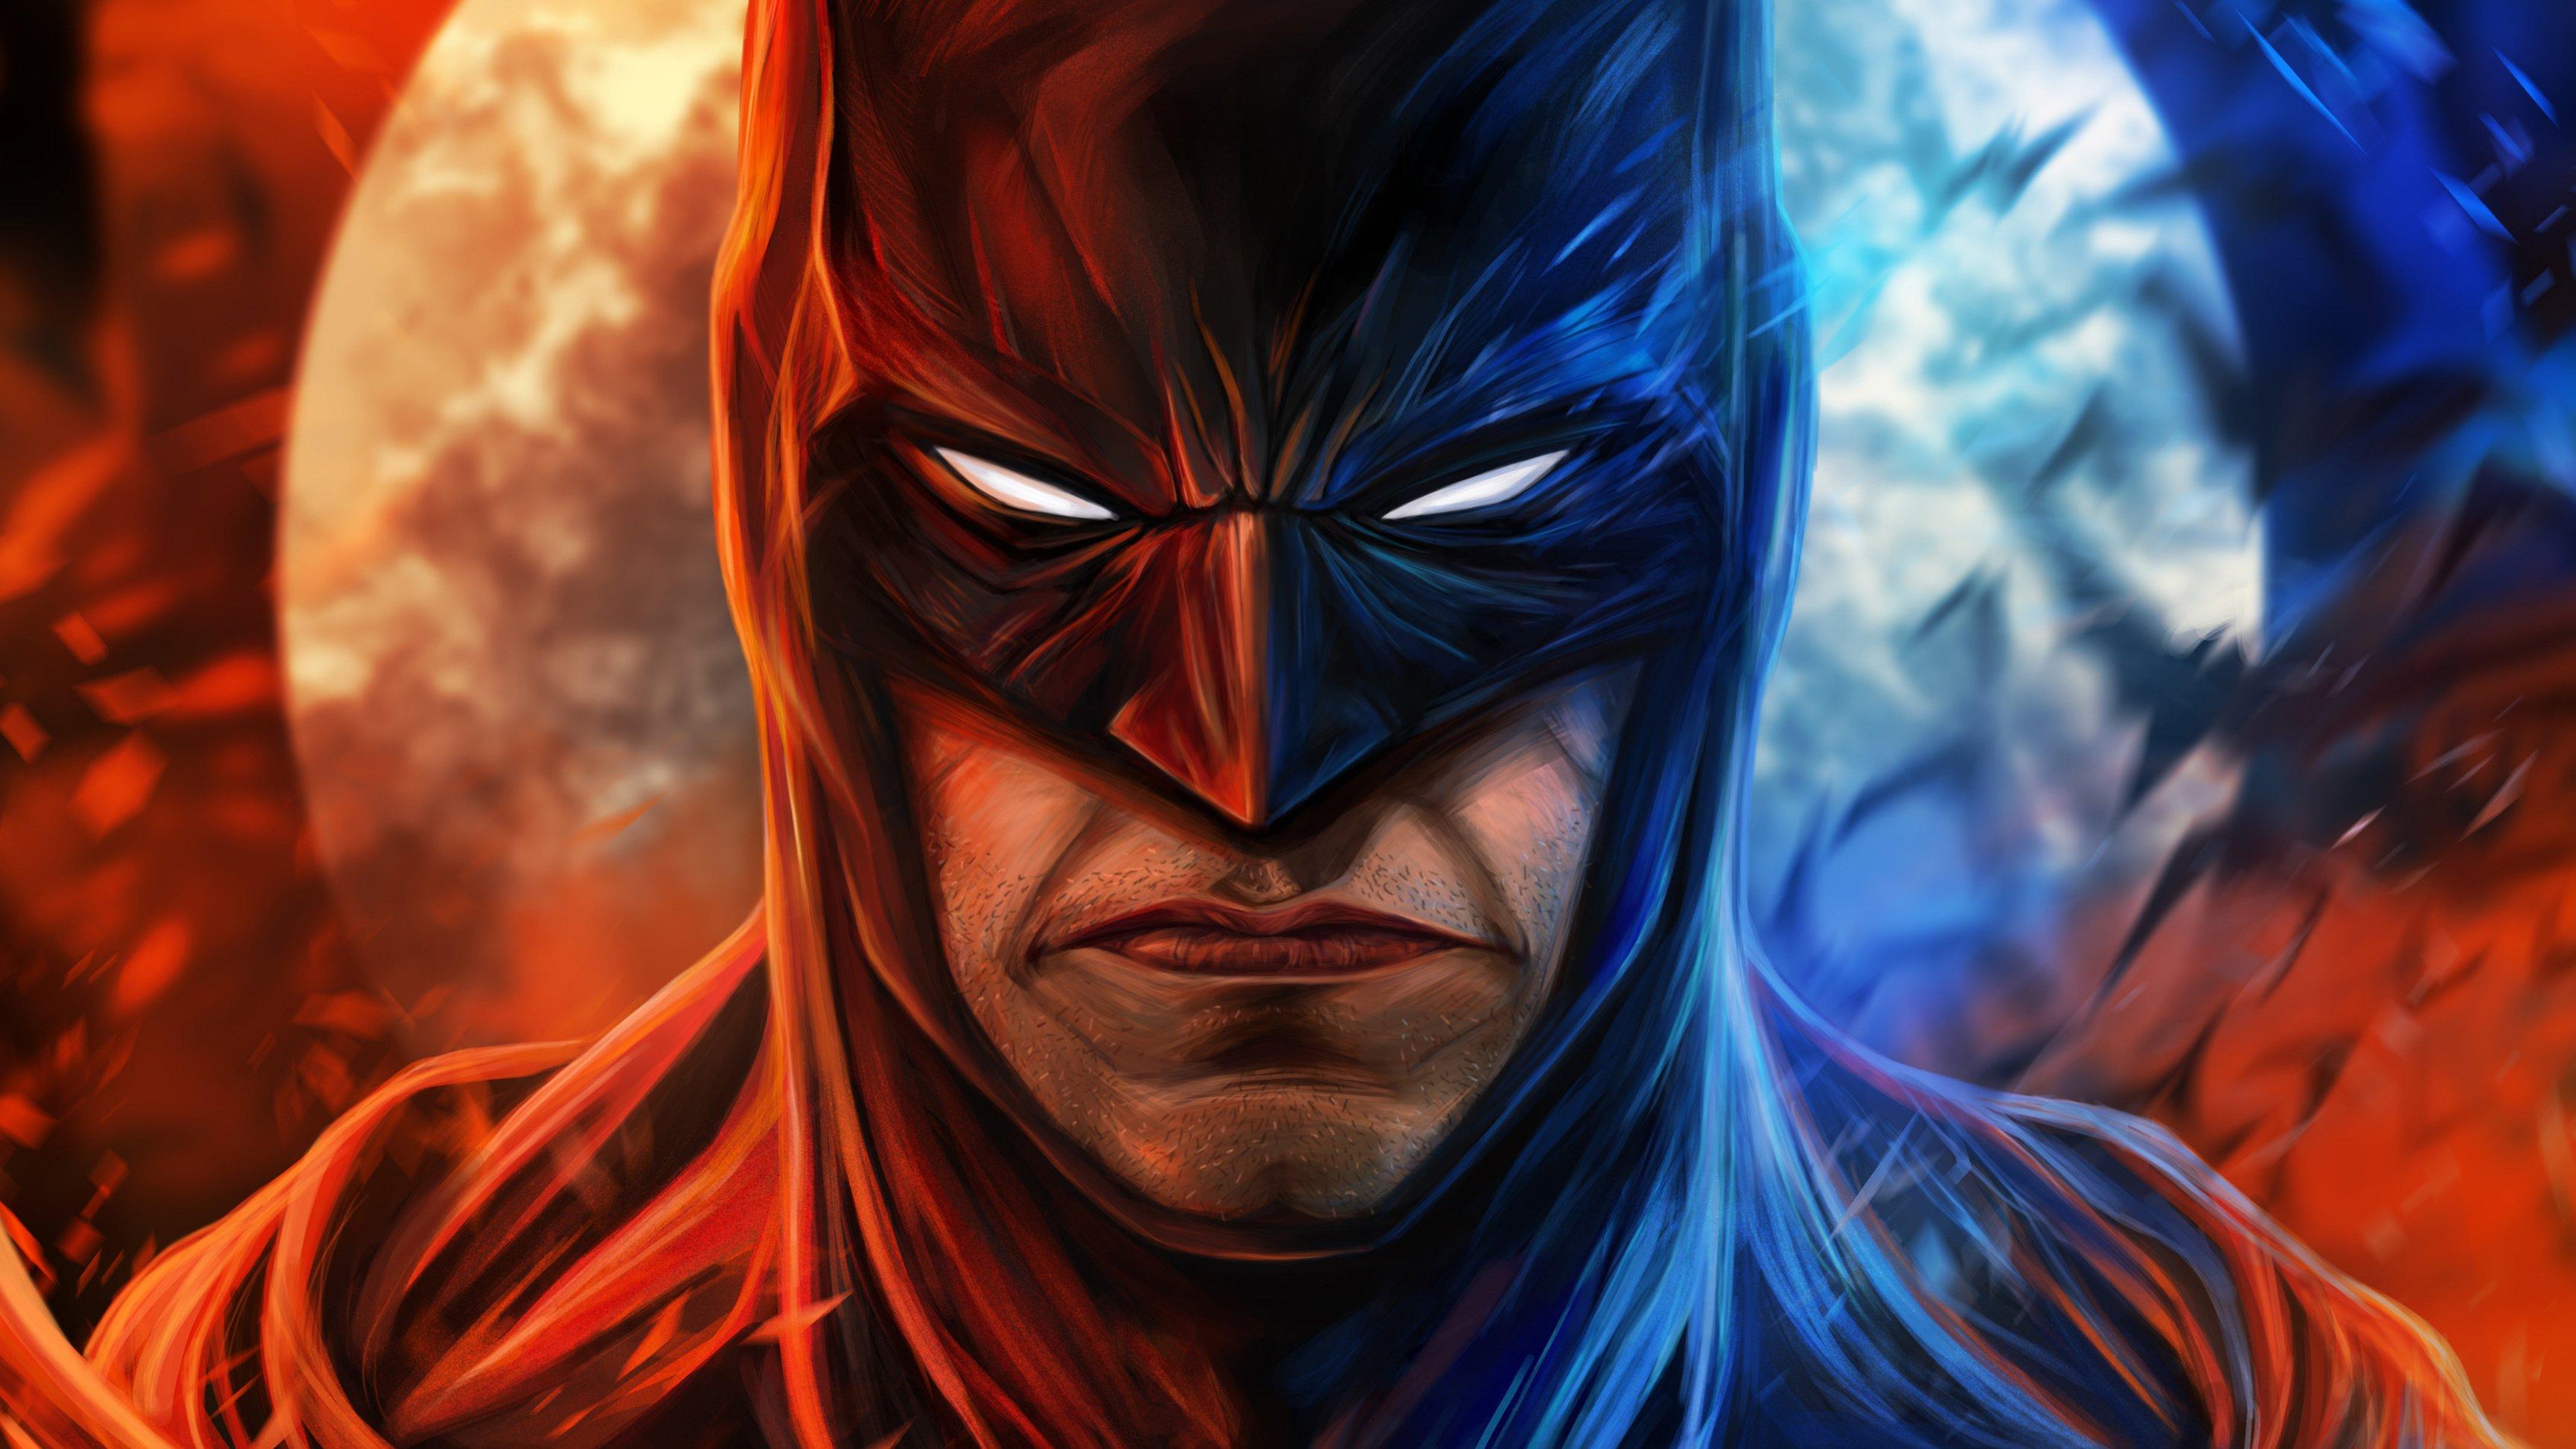 Wallpaper Batman angry